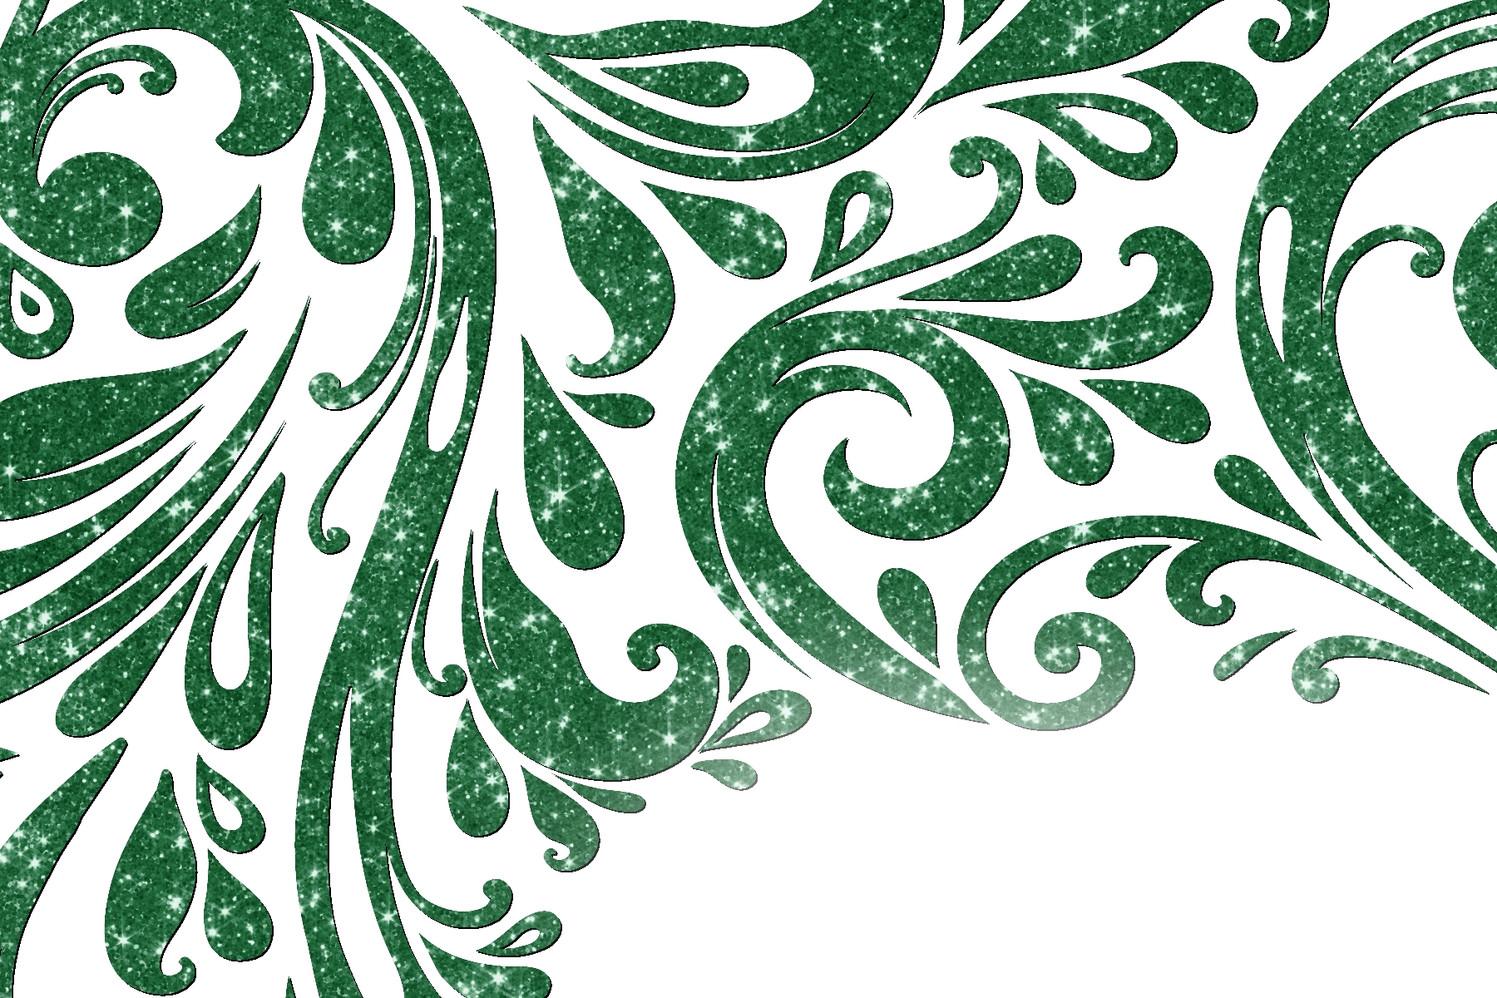 Vert émeraude foncé scintillant